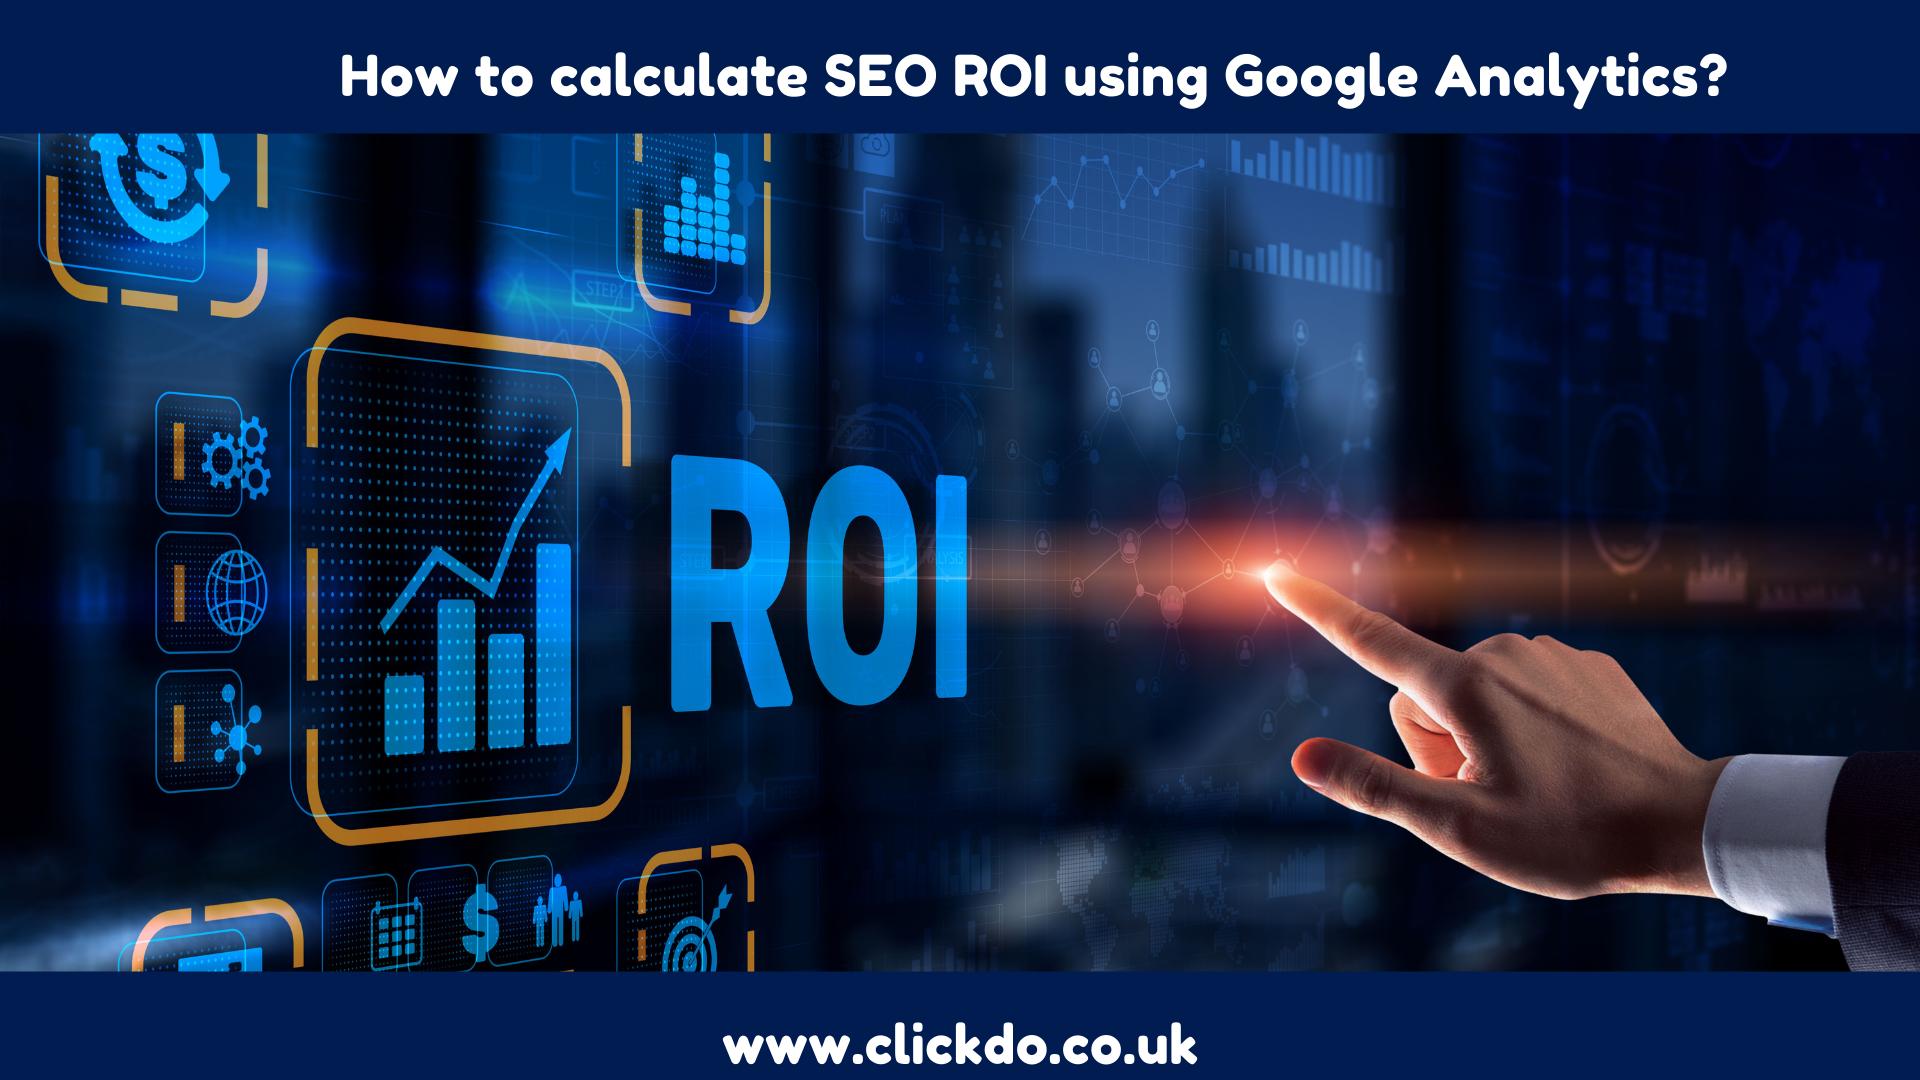 How to calculate SEO ROI using Google Analytics